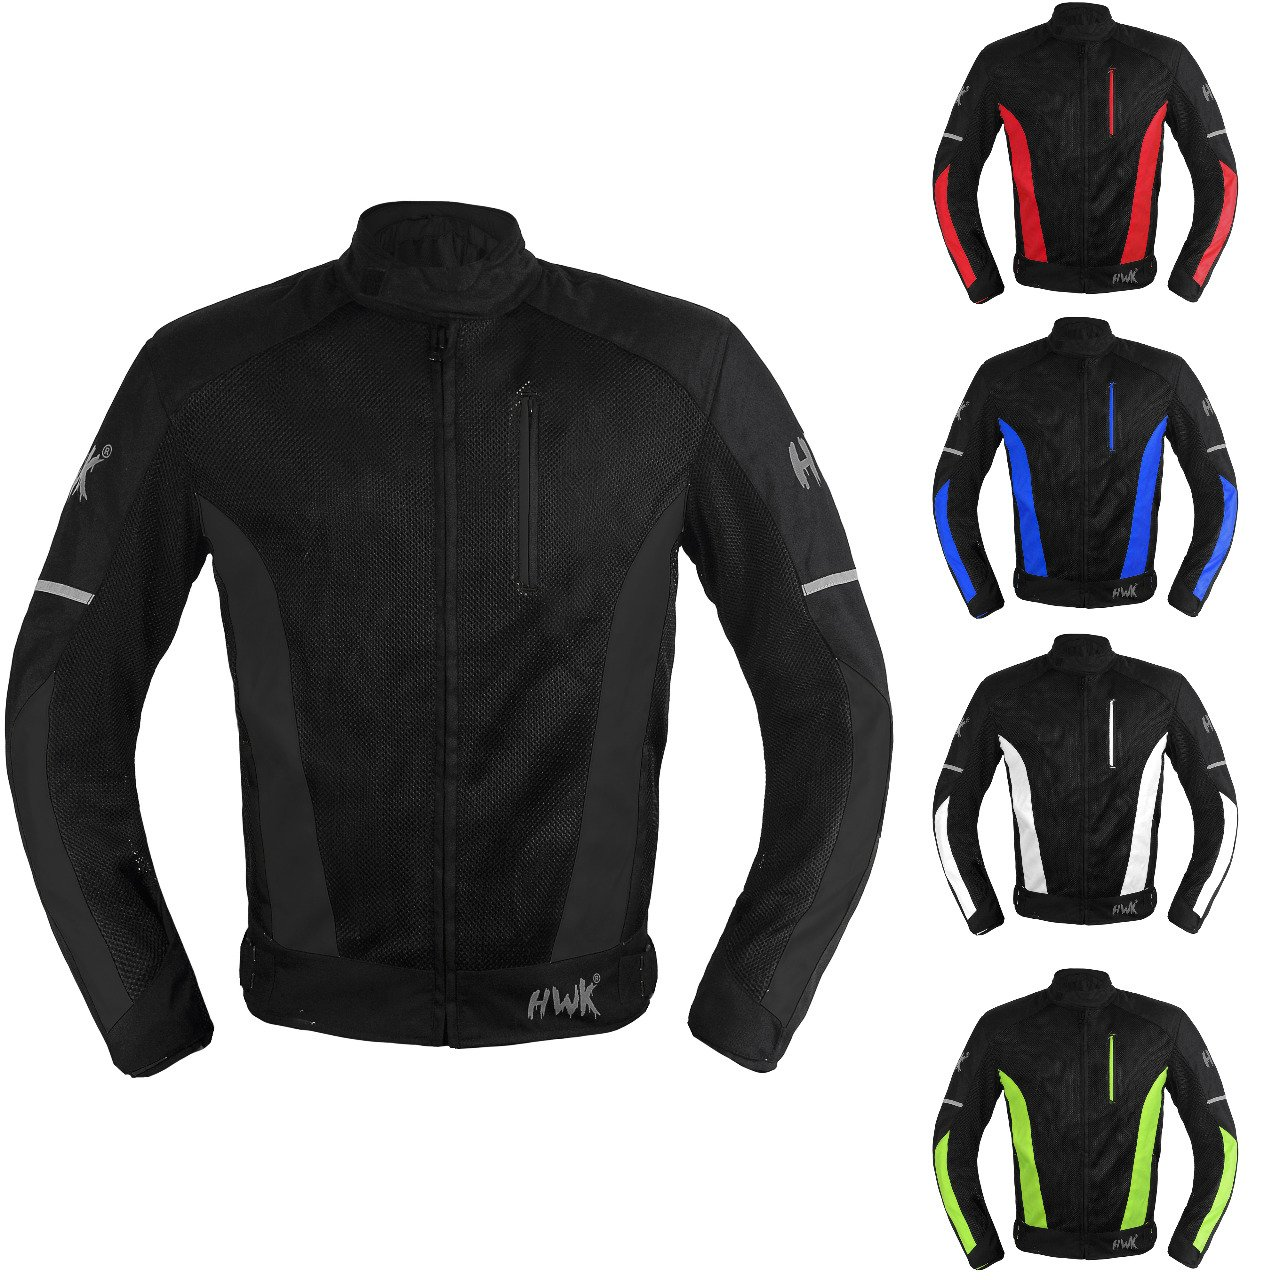 Mesh Motorcycle Jacket Textile Motorbike Summer Biker Air Jacket CE ARMOURED BREATHABLE (Medium, Black)